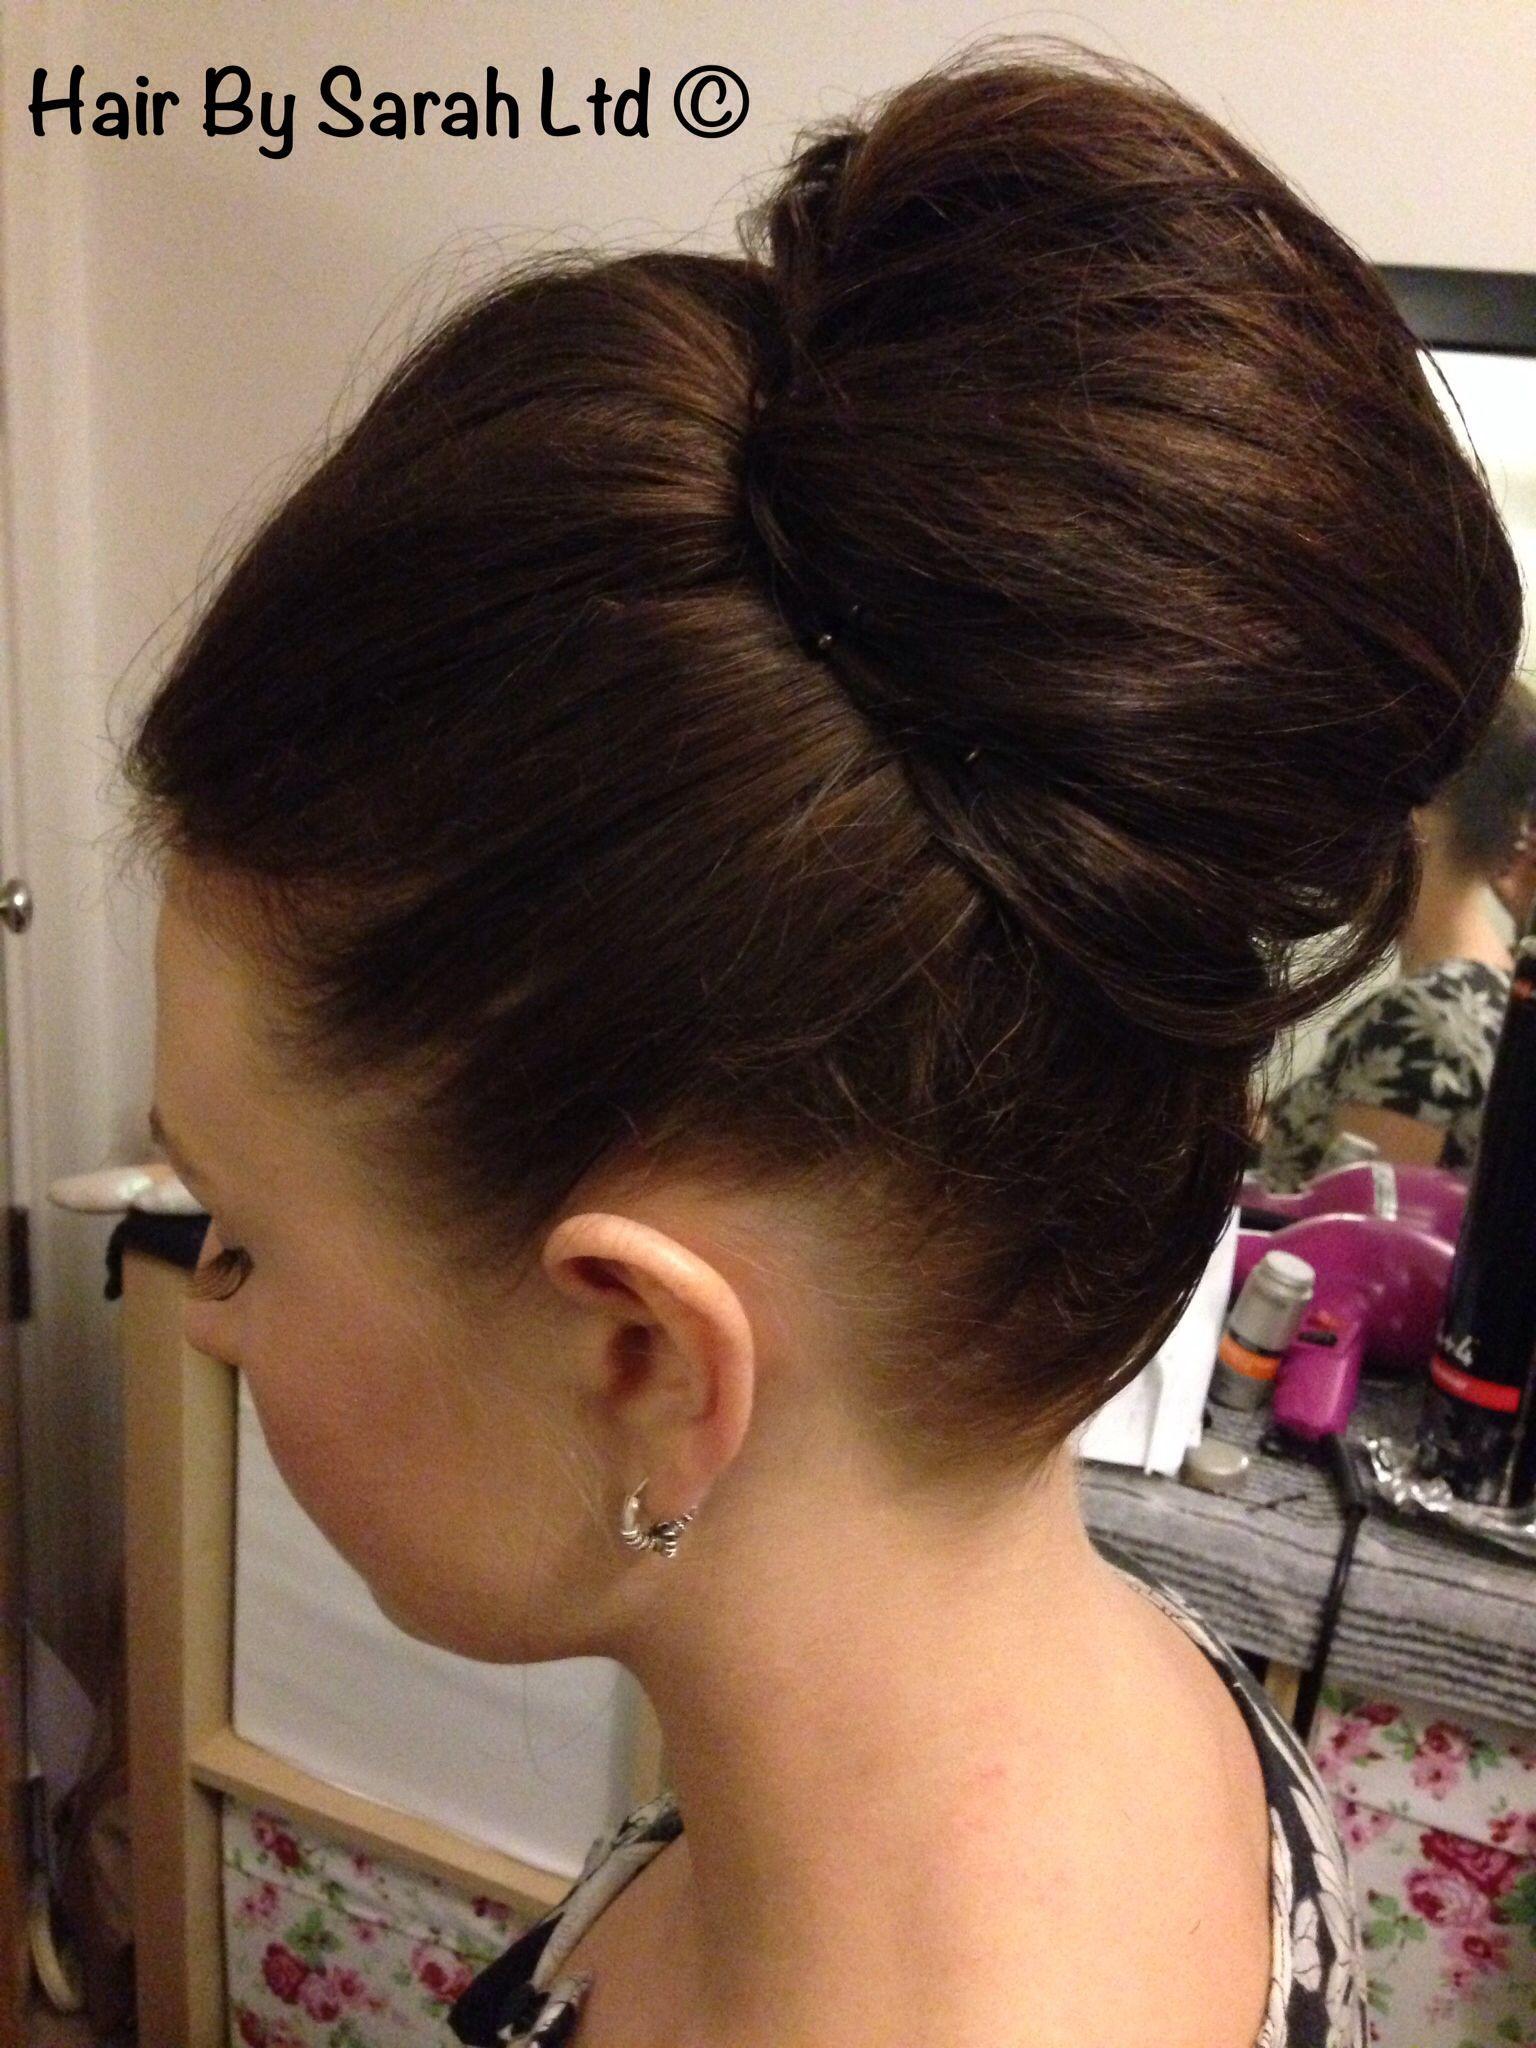 Hair Up Elegant Updo Classic Hair Smooth Volume Padding